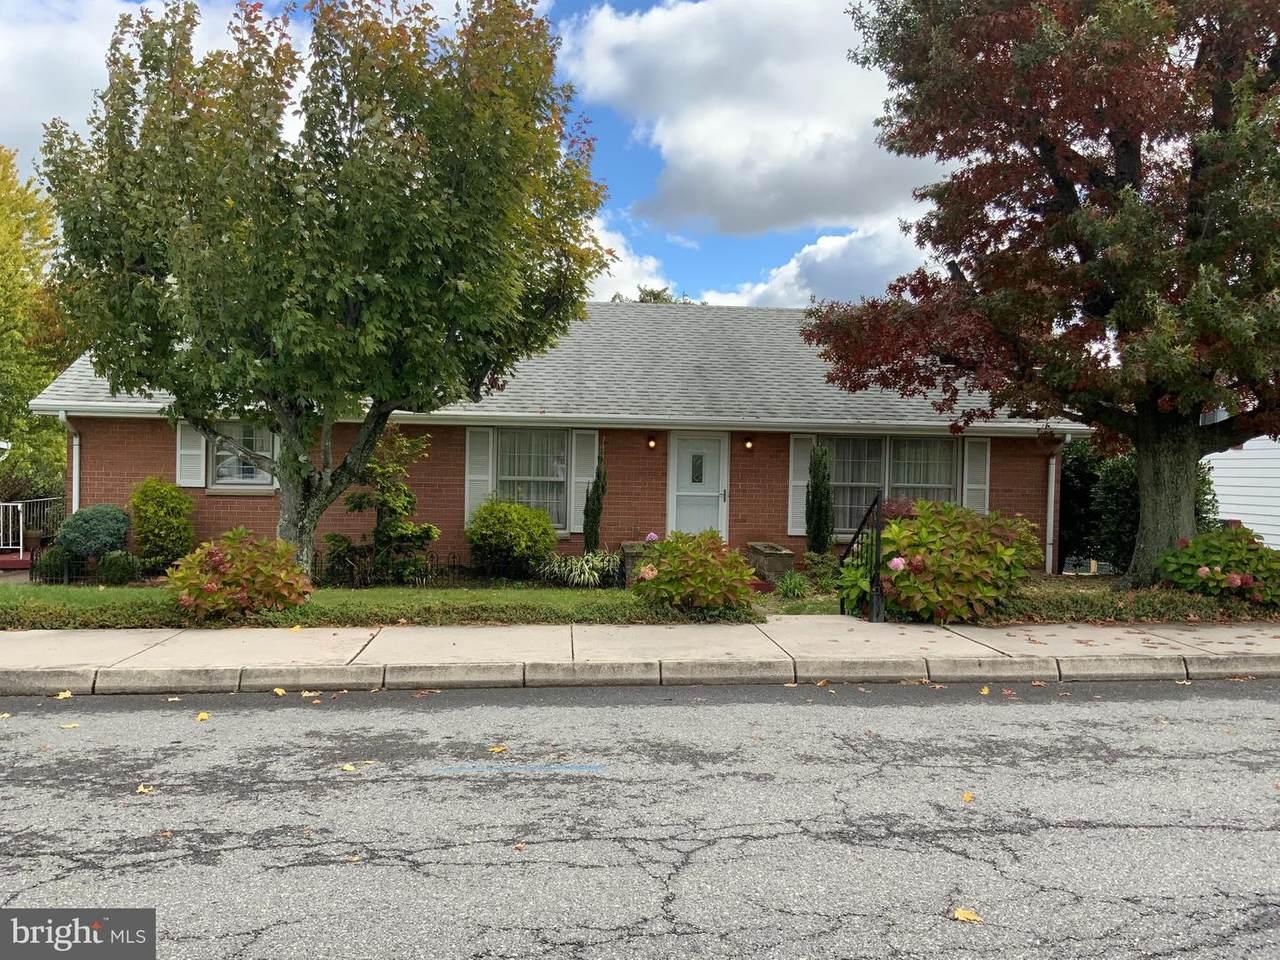 706 Avondale Avenue - Photo 1